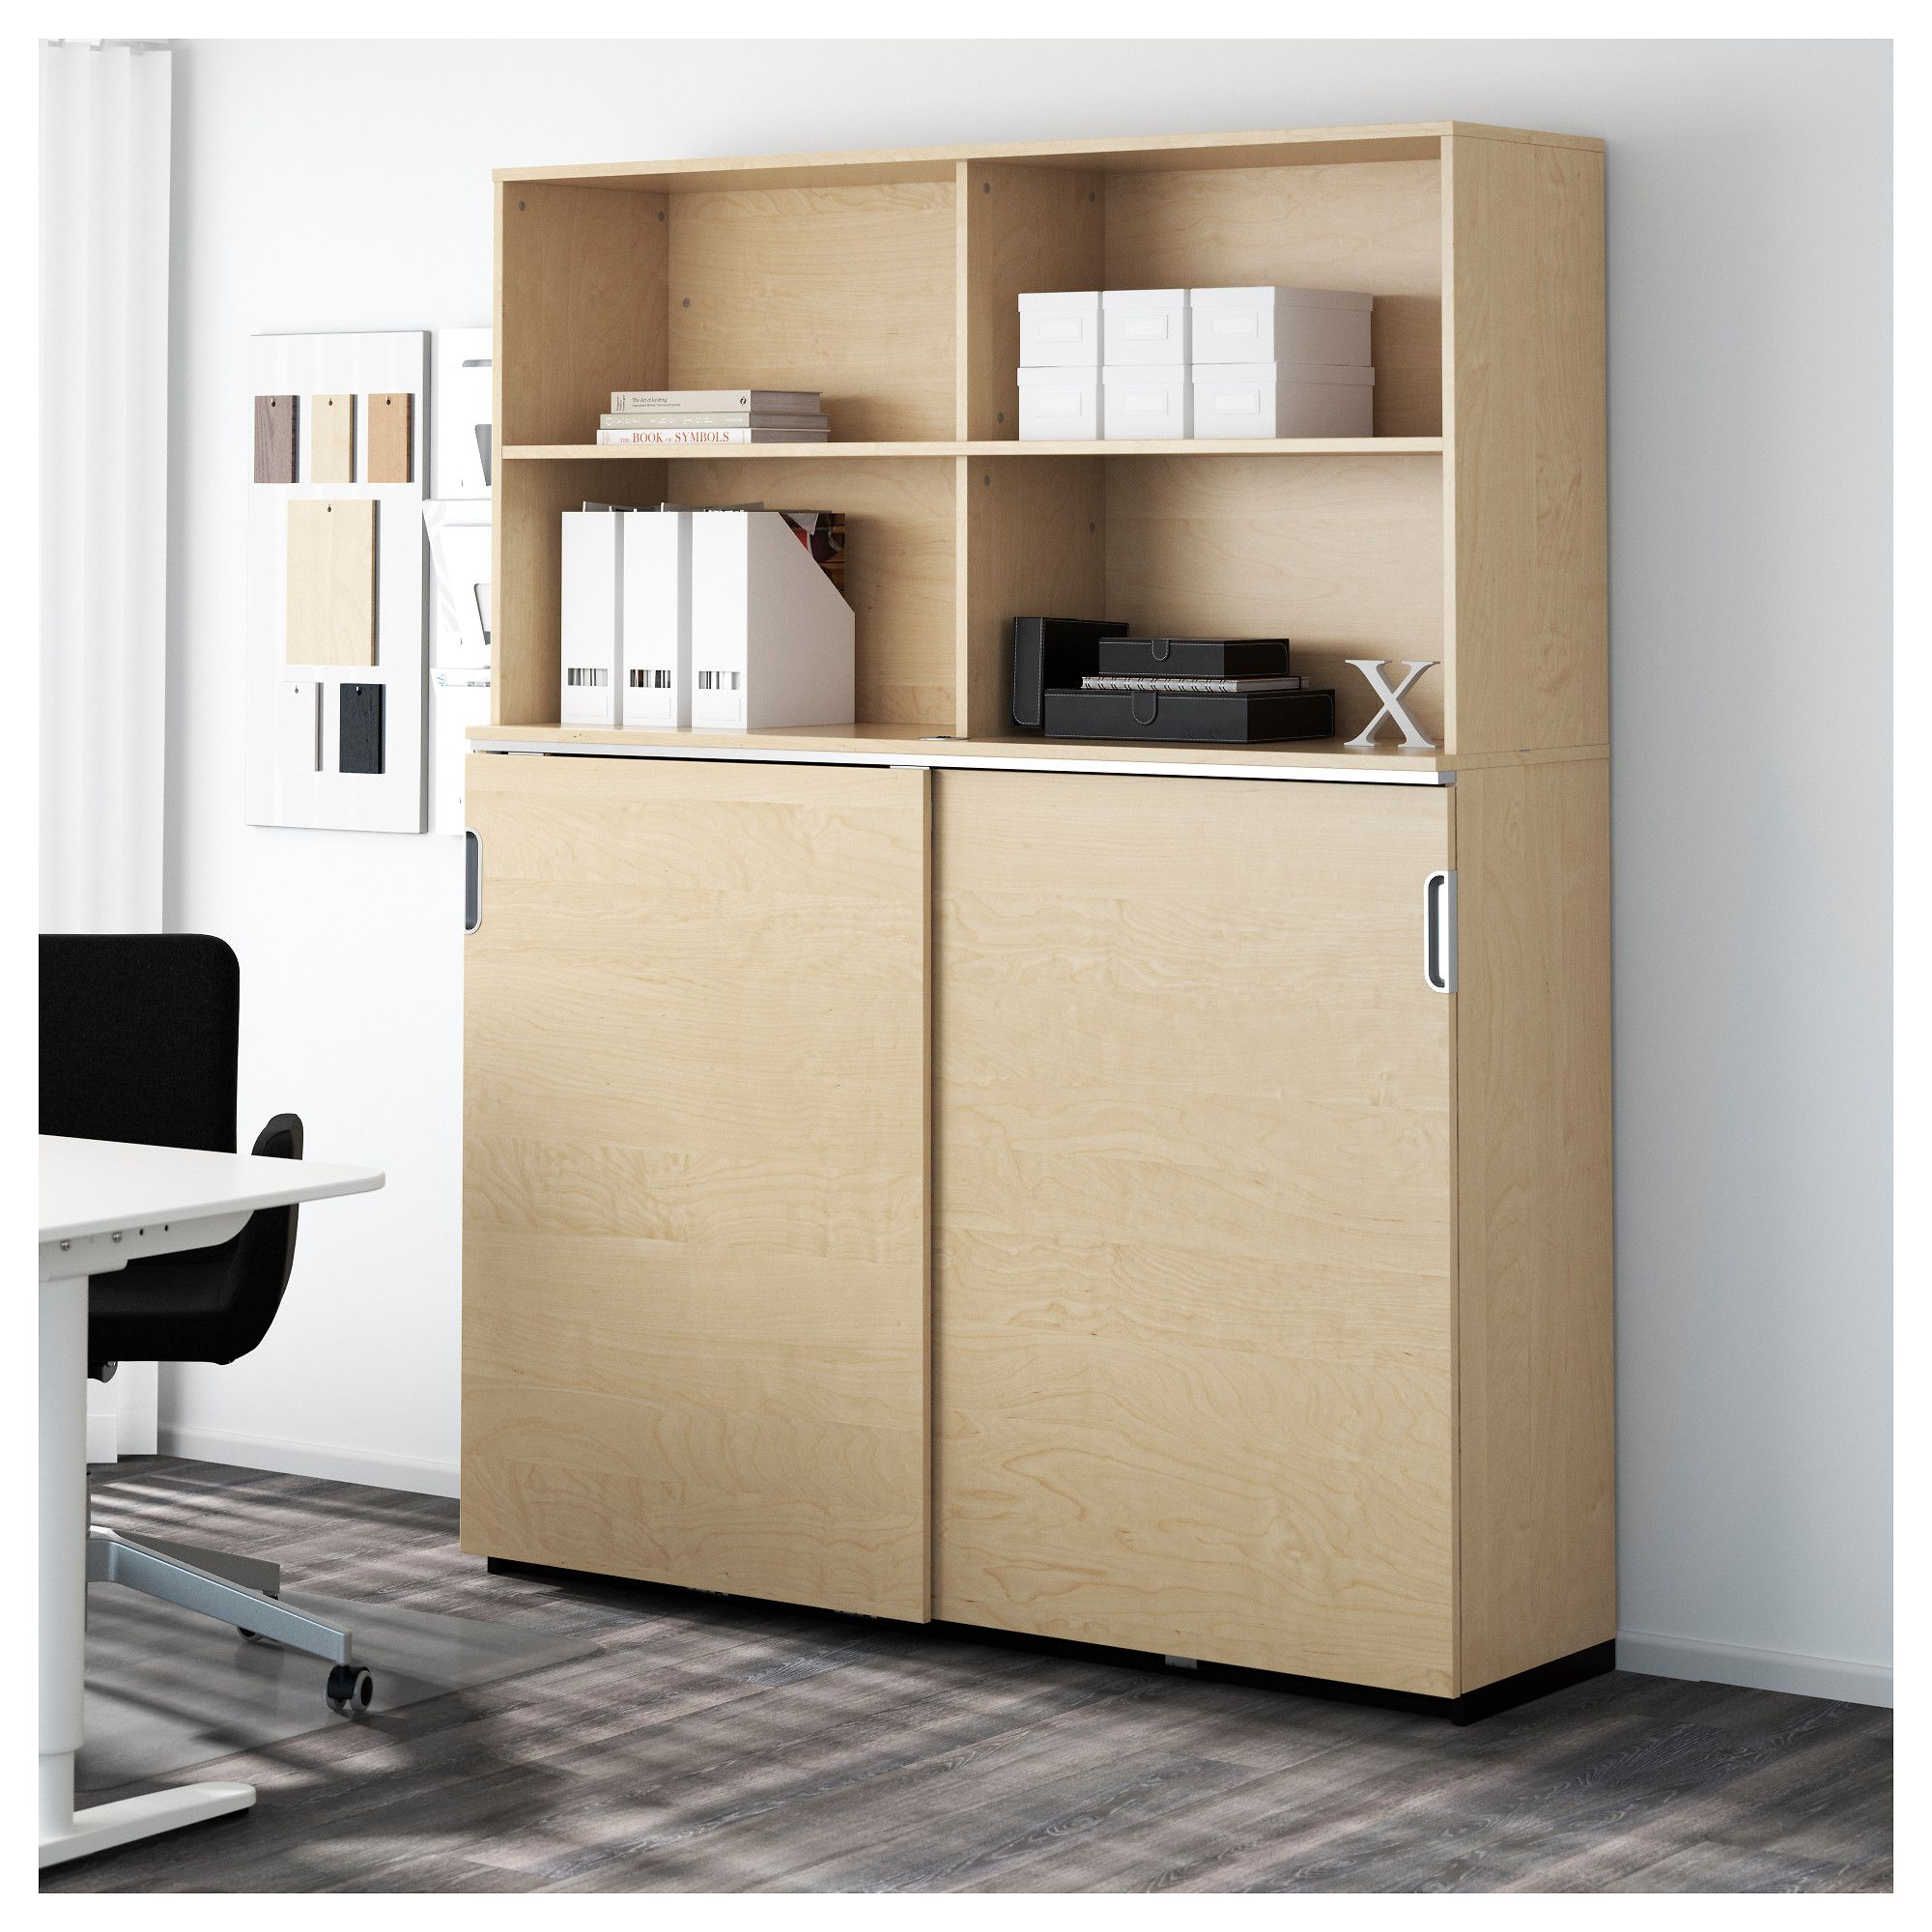 GALANT Storage Combination W Sliding Doors, Birch Veneer